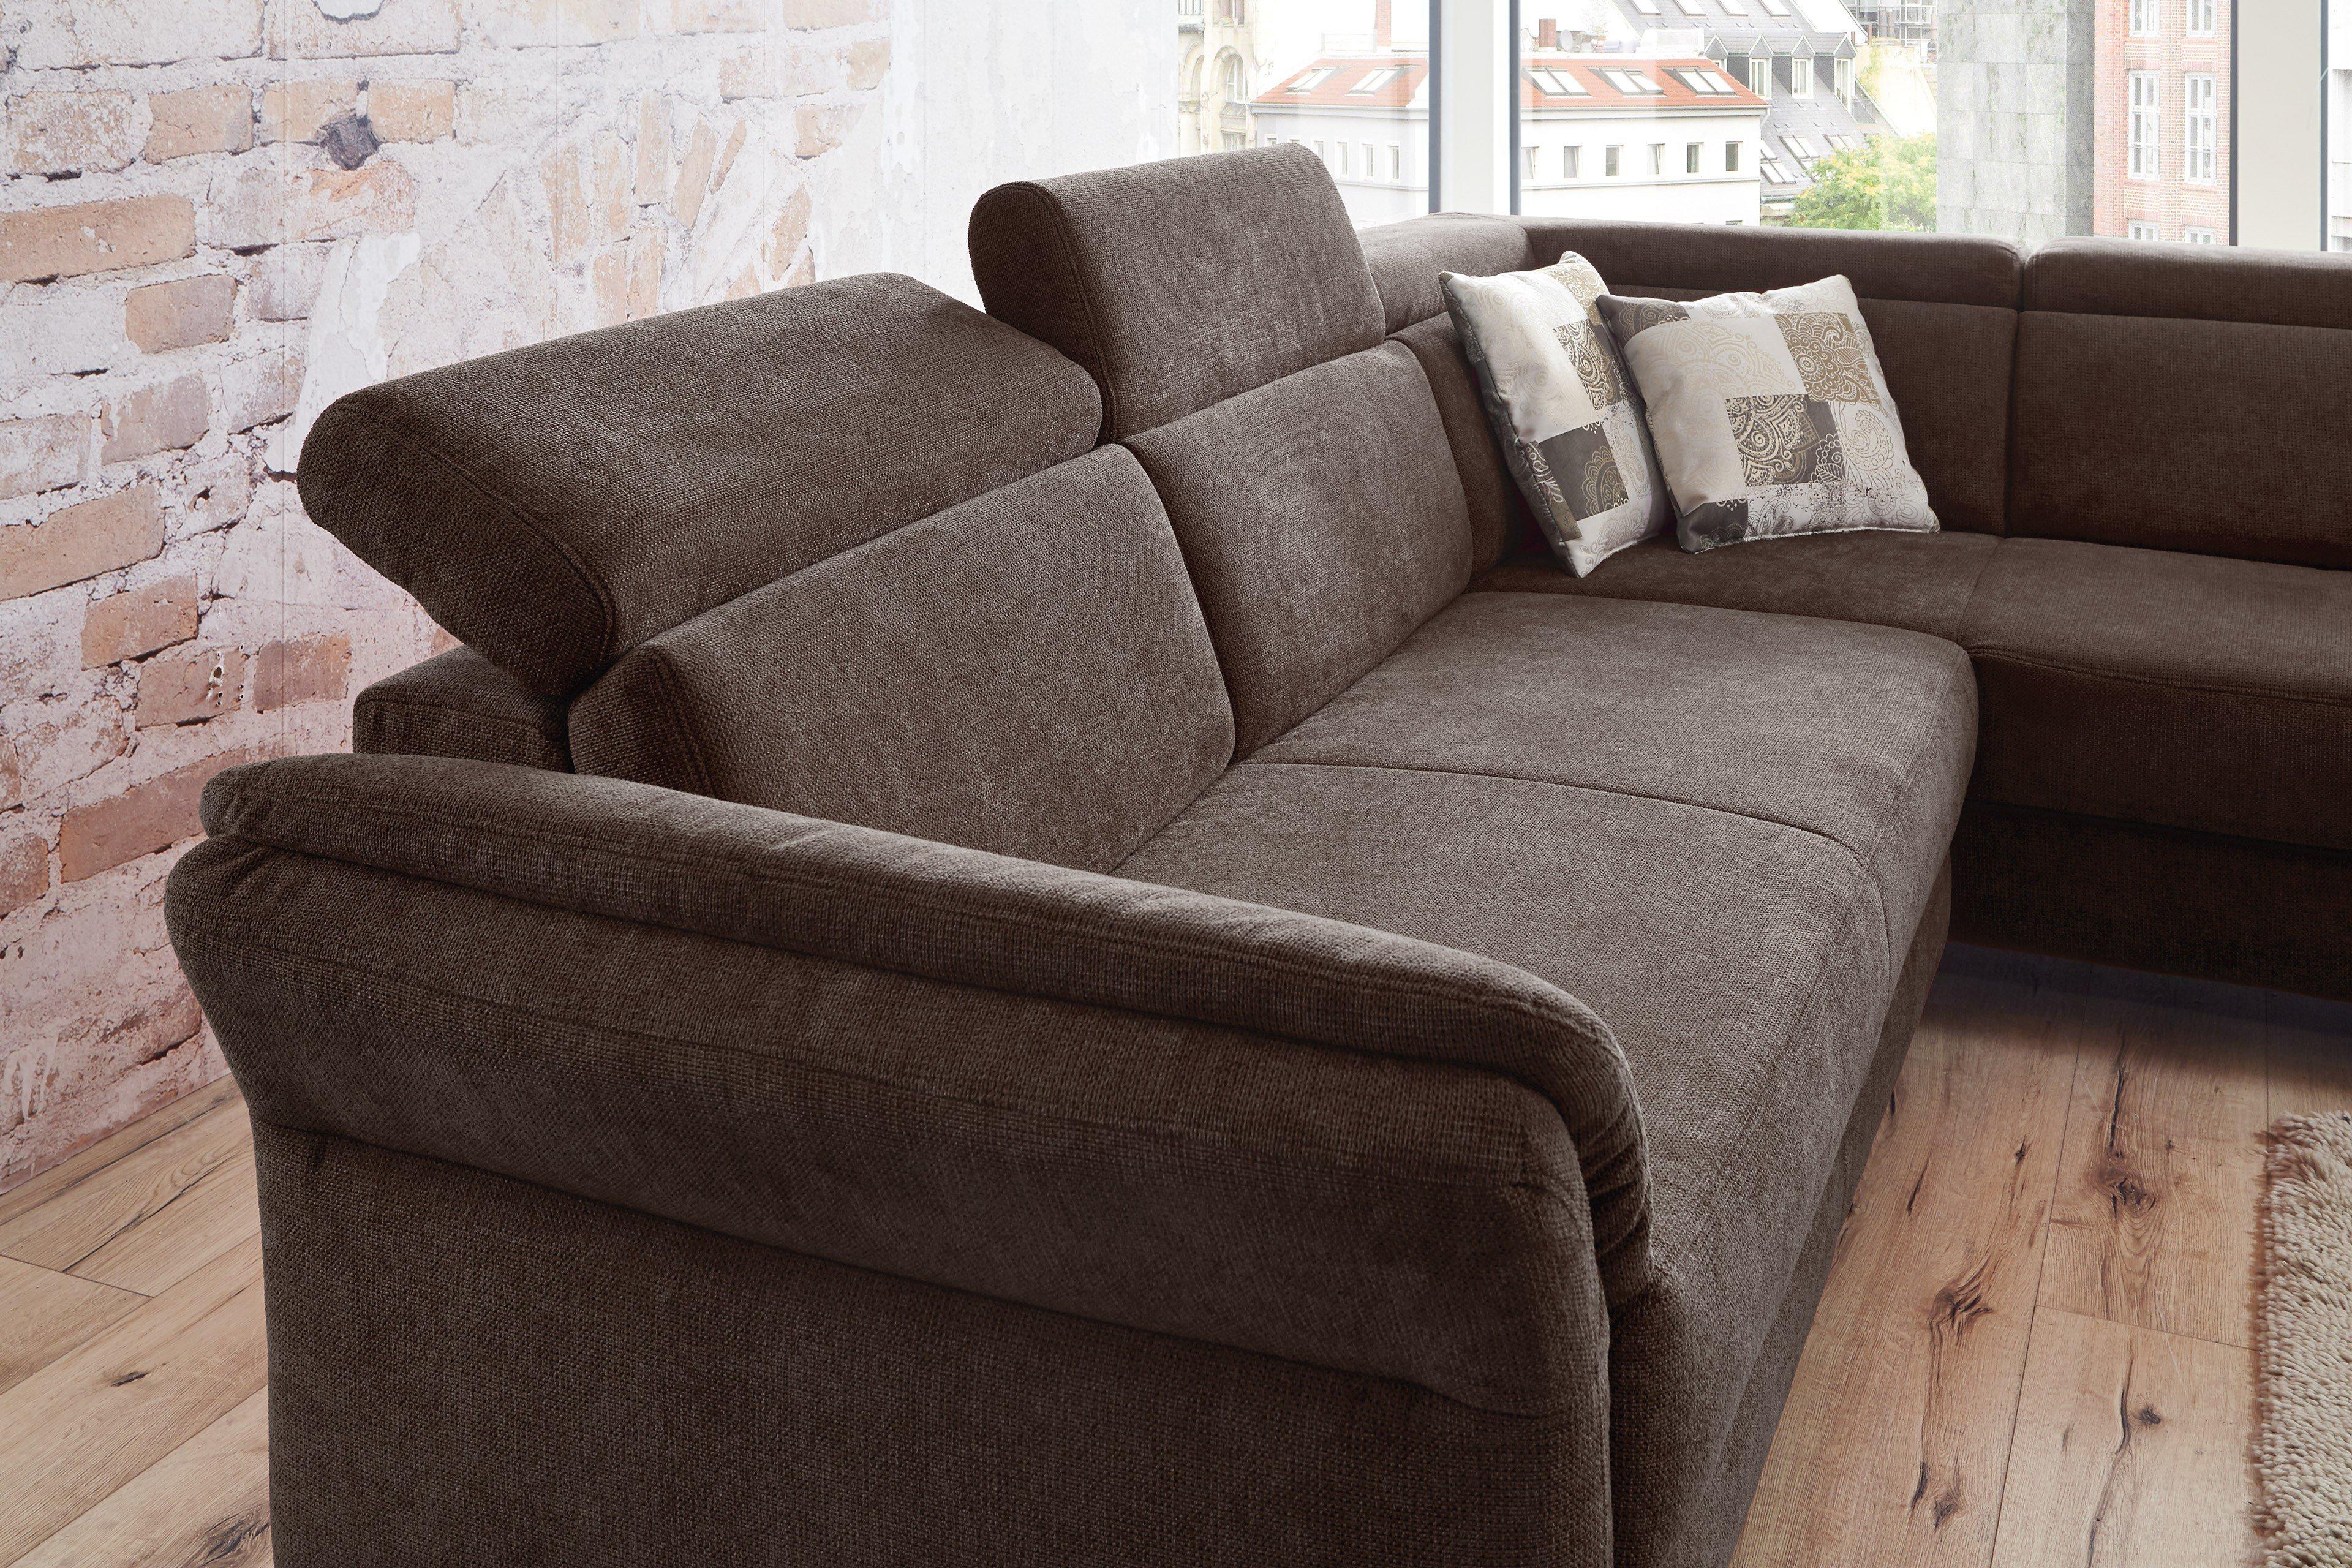 sit more avignon eckgarnitur braun m bel letz ihr online shop. Black Bedroom Furniture Sets. Home Design Ideas